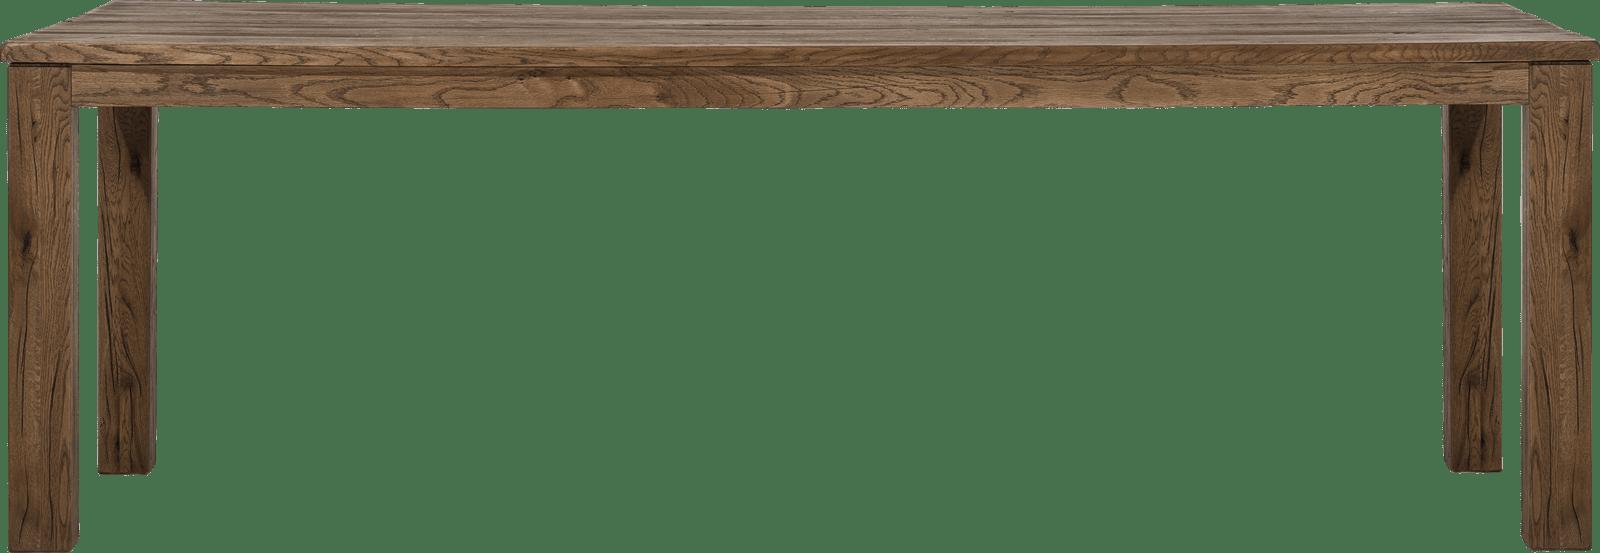 Masters - eetkamertafel 240 x 100 cm - hout 9x9